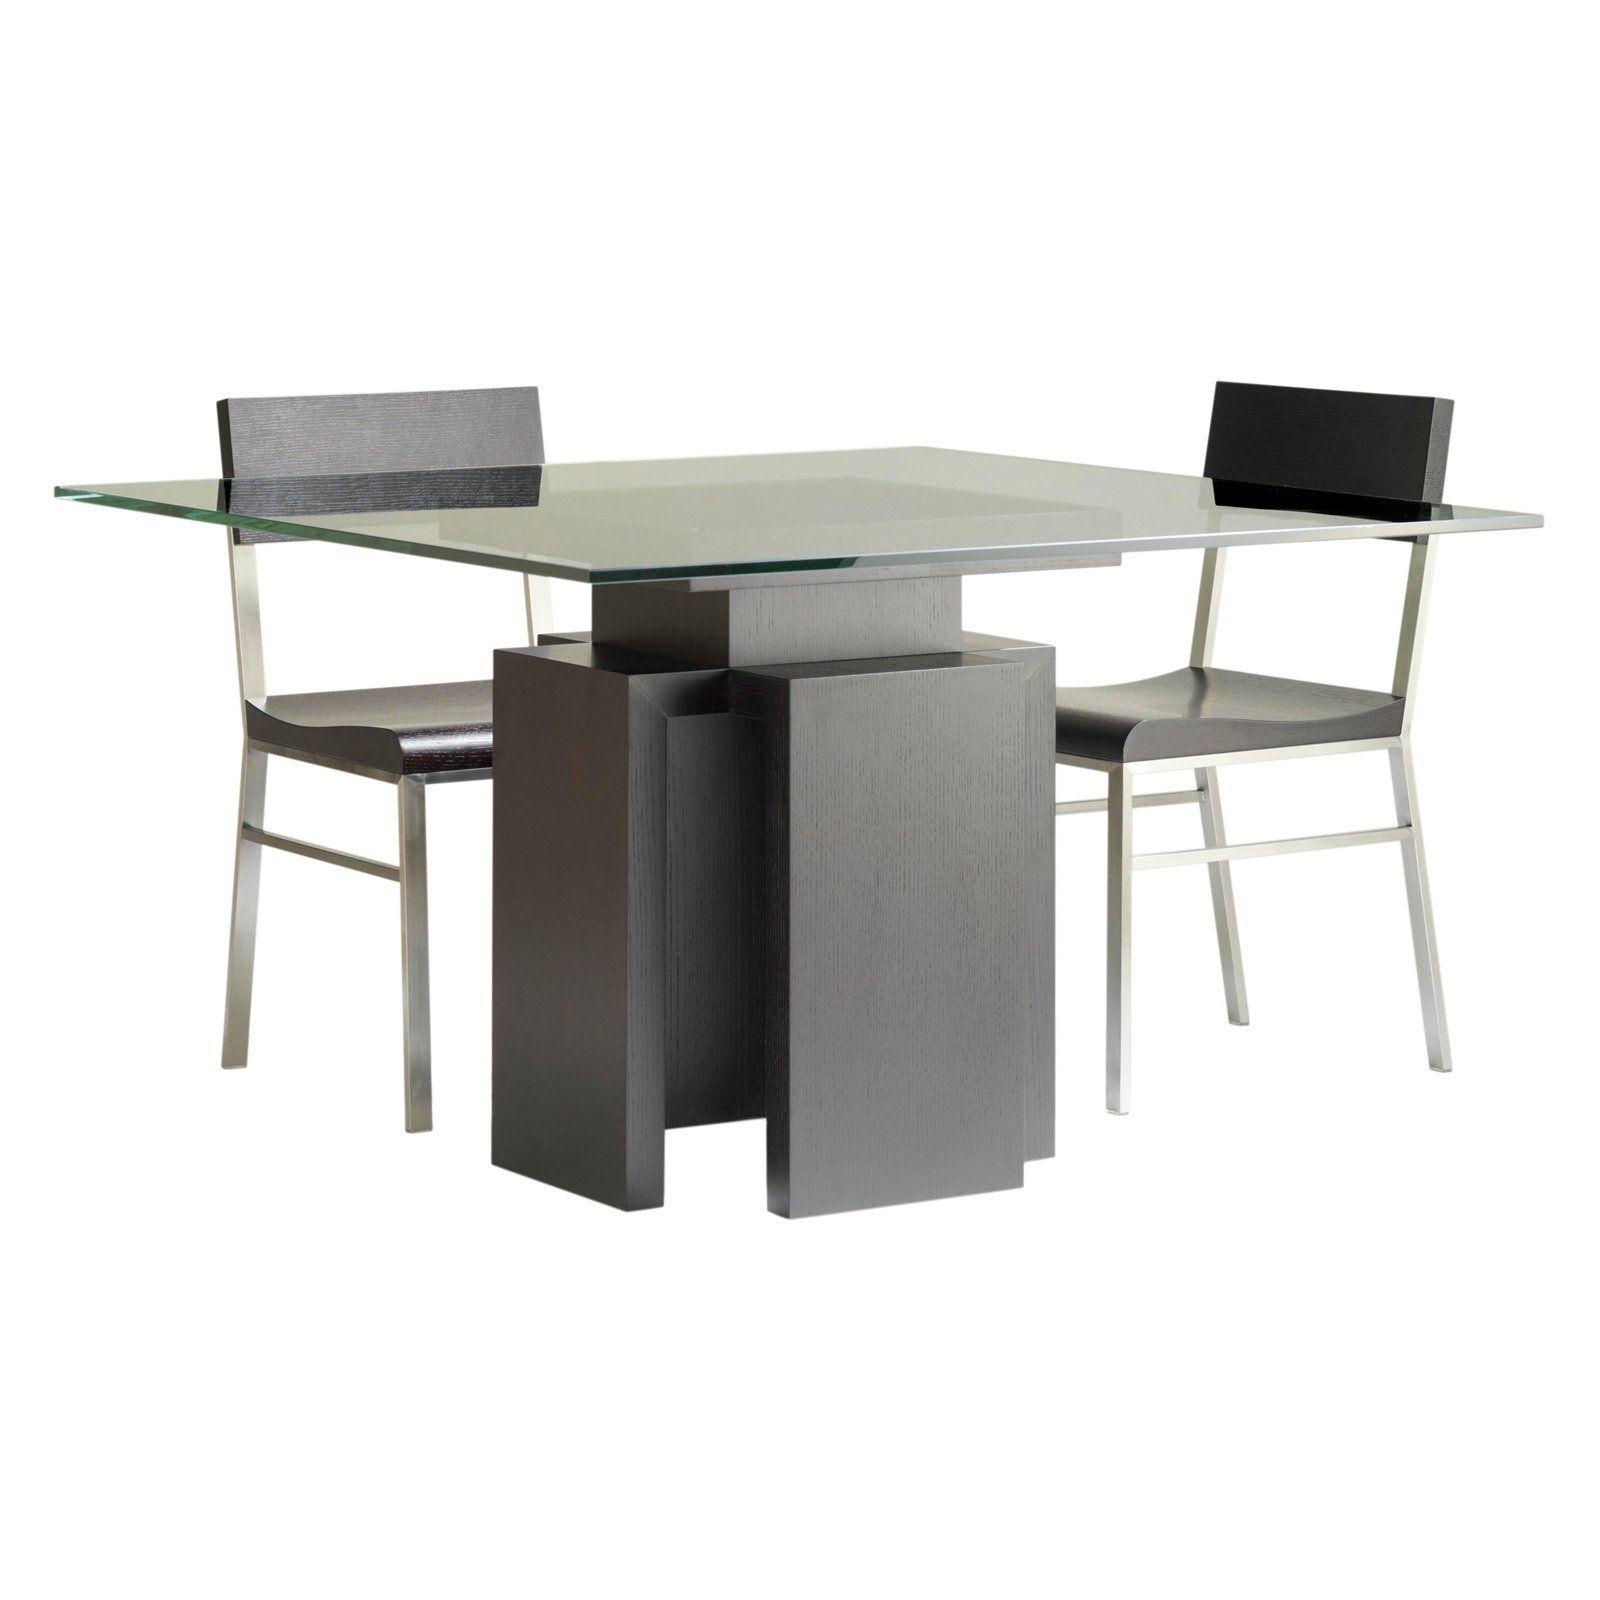 allan copley designs sebring glass top dining table in 2019 rh pinterest com